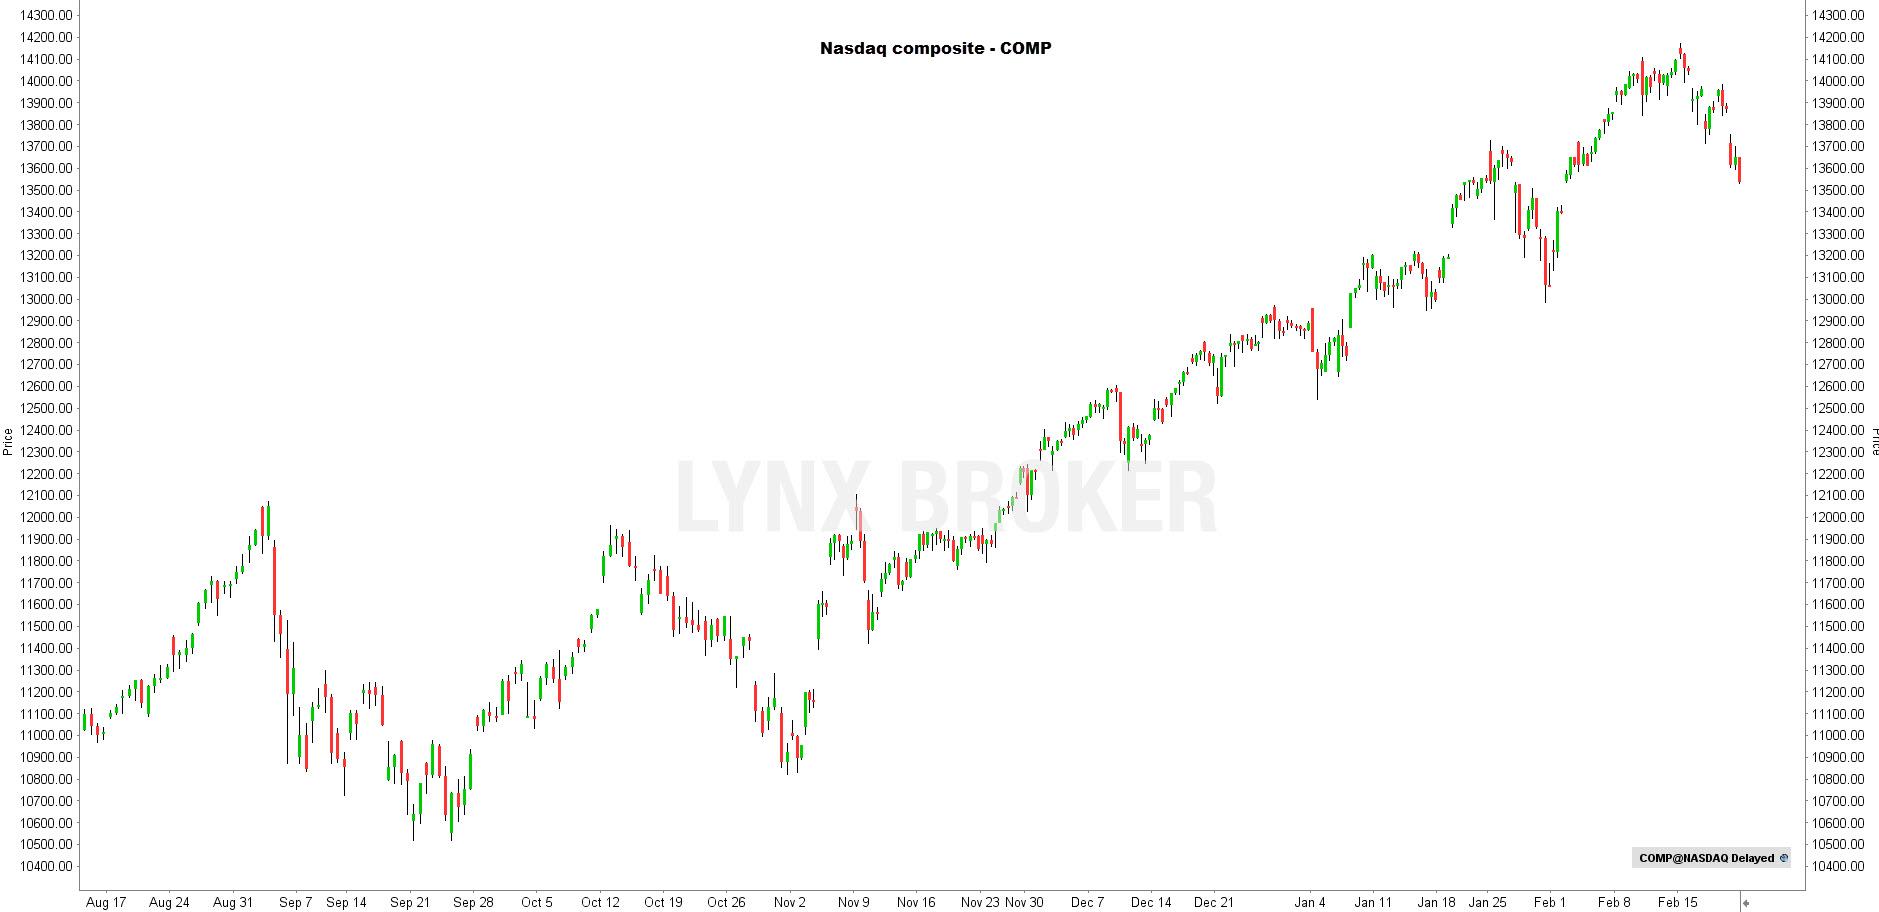 la chronique lynx broker 230221 - graphique Nasdaq